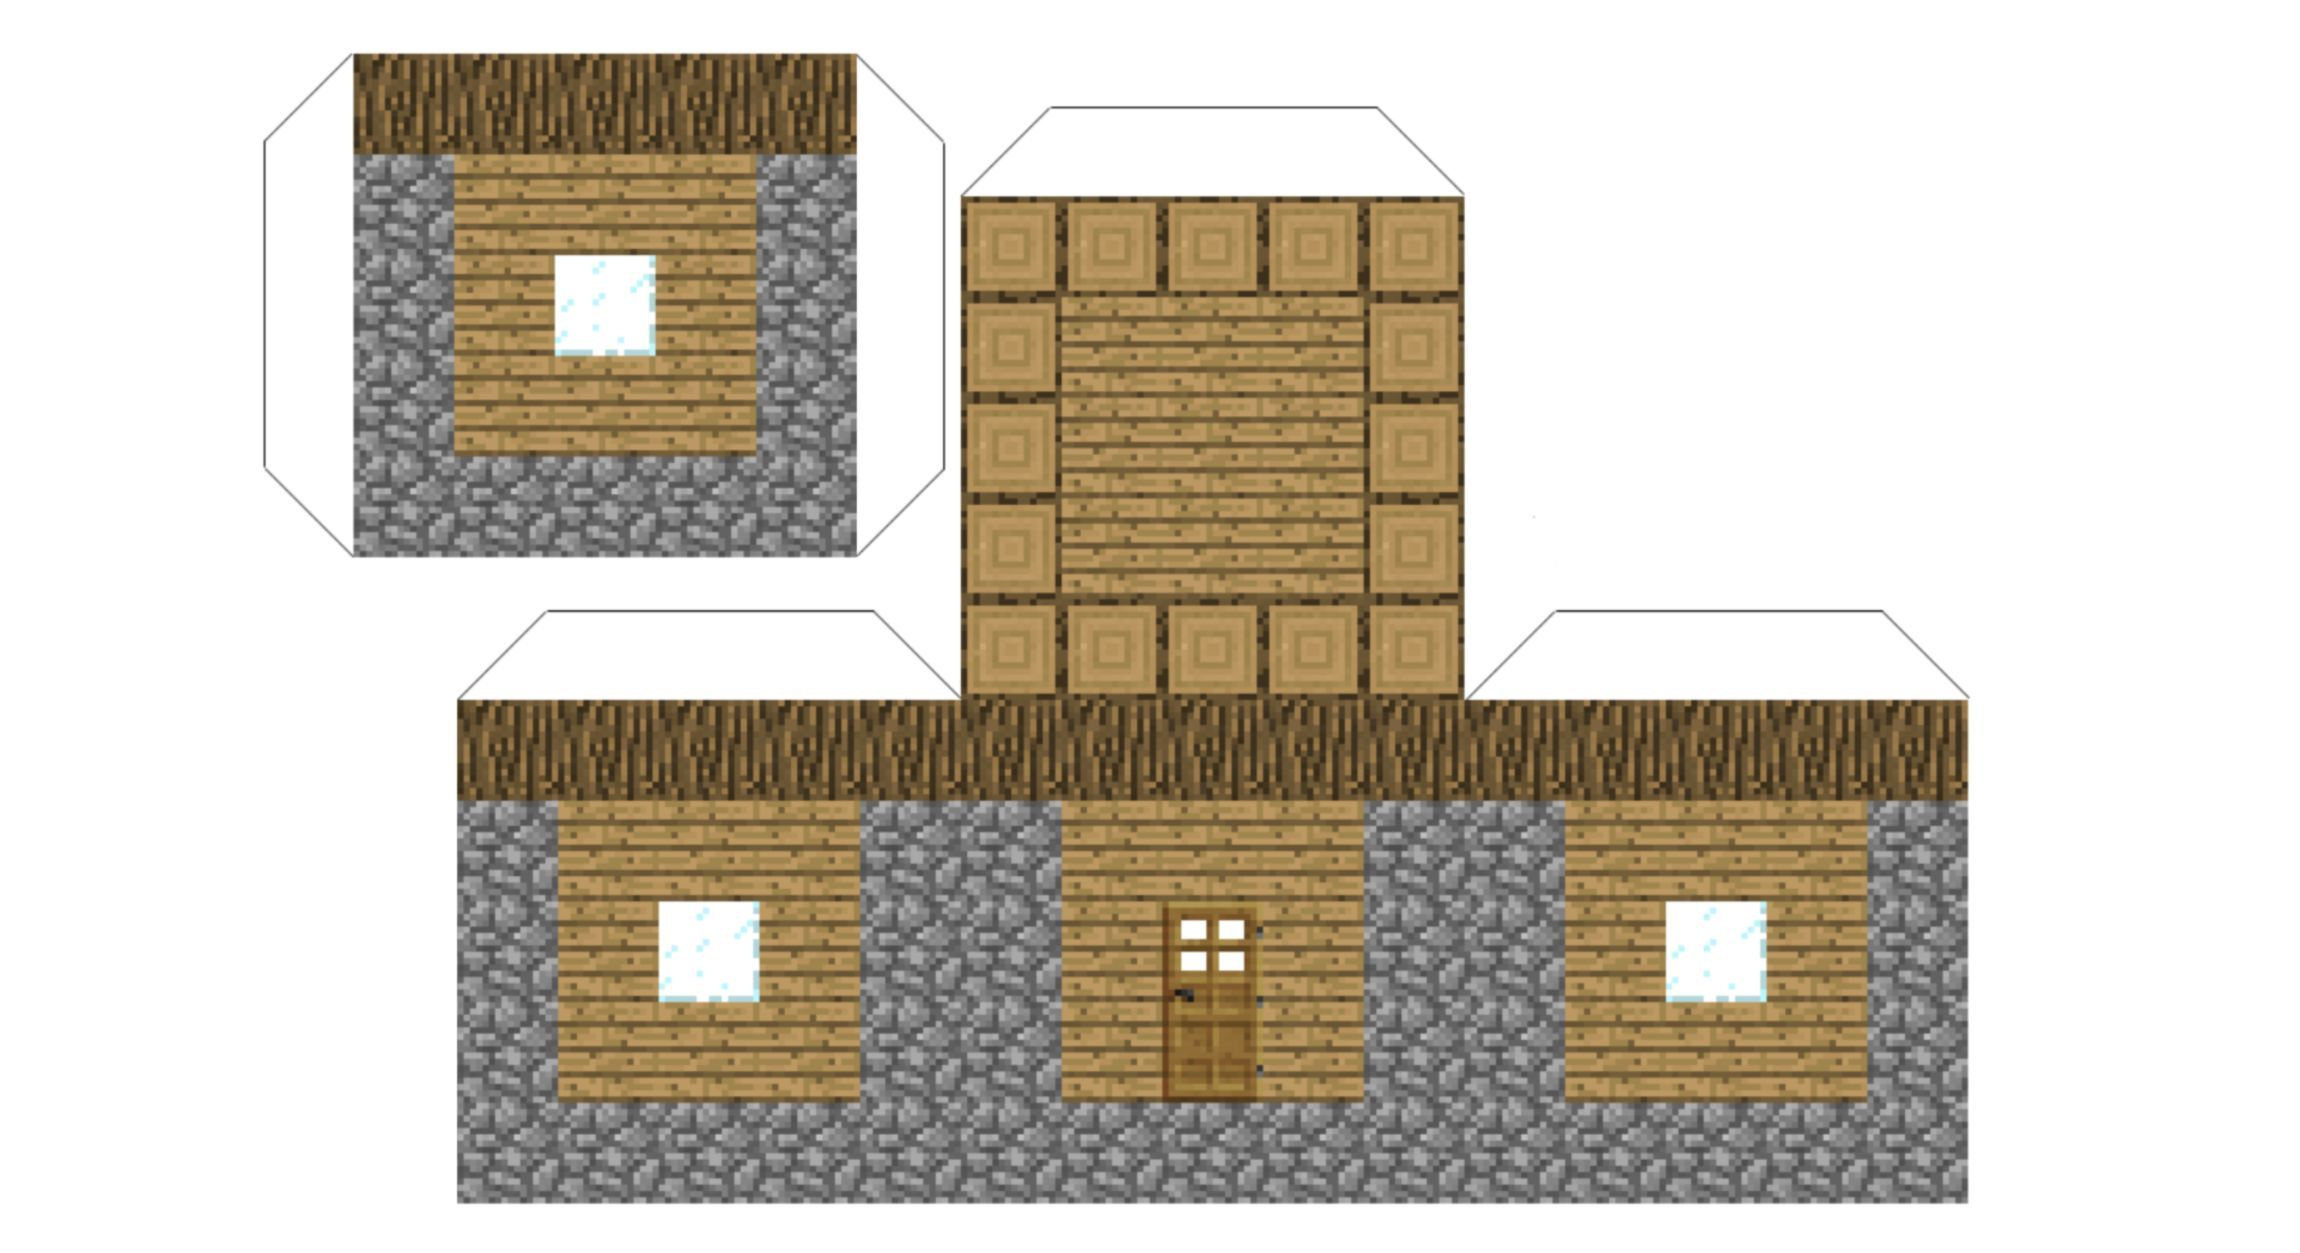 Papercraft npc house emilys paper crafts pinterest papercraft npc house jeuxipadfo Image collections